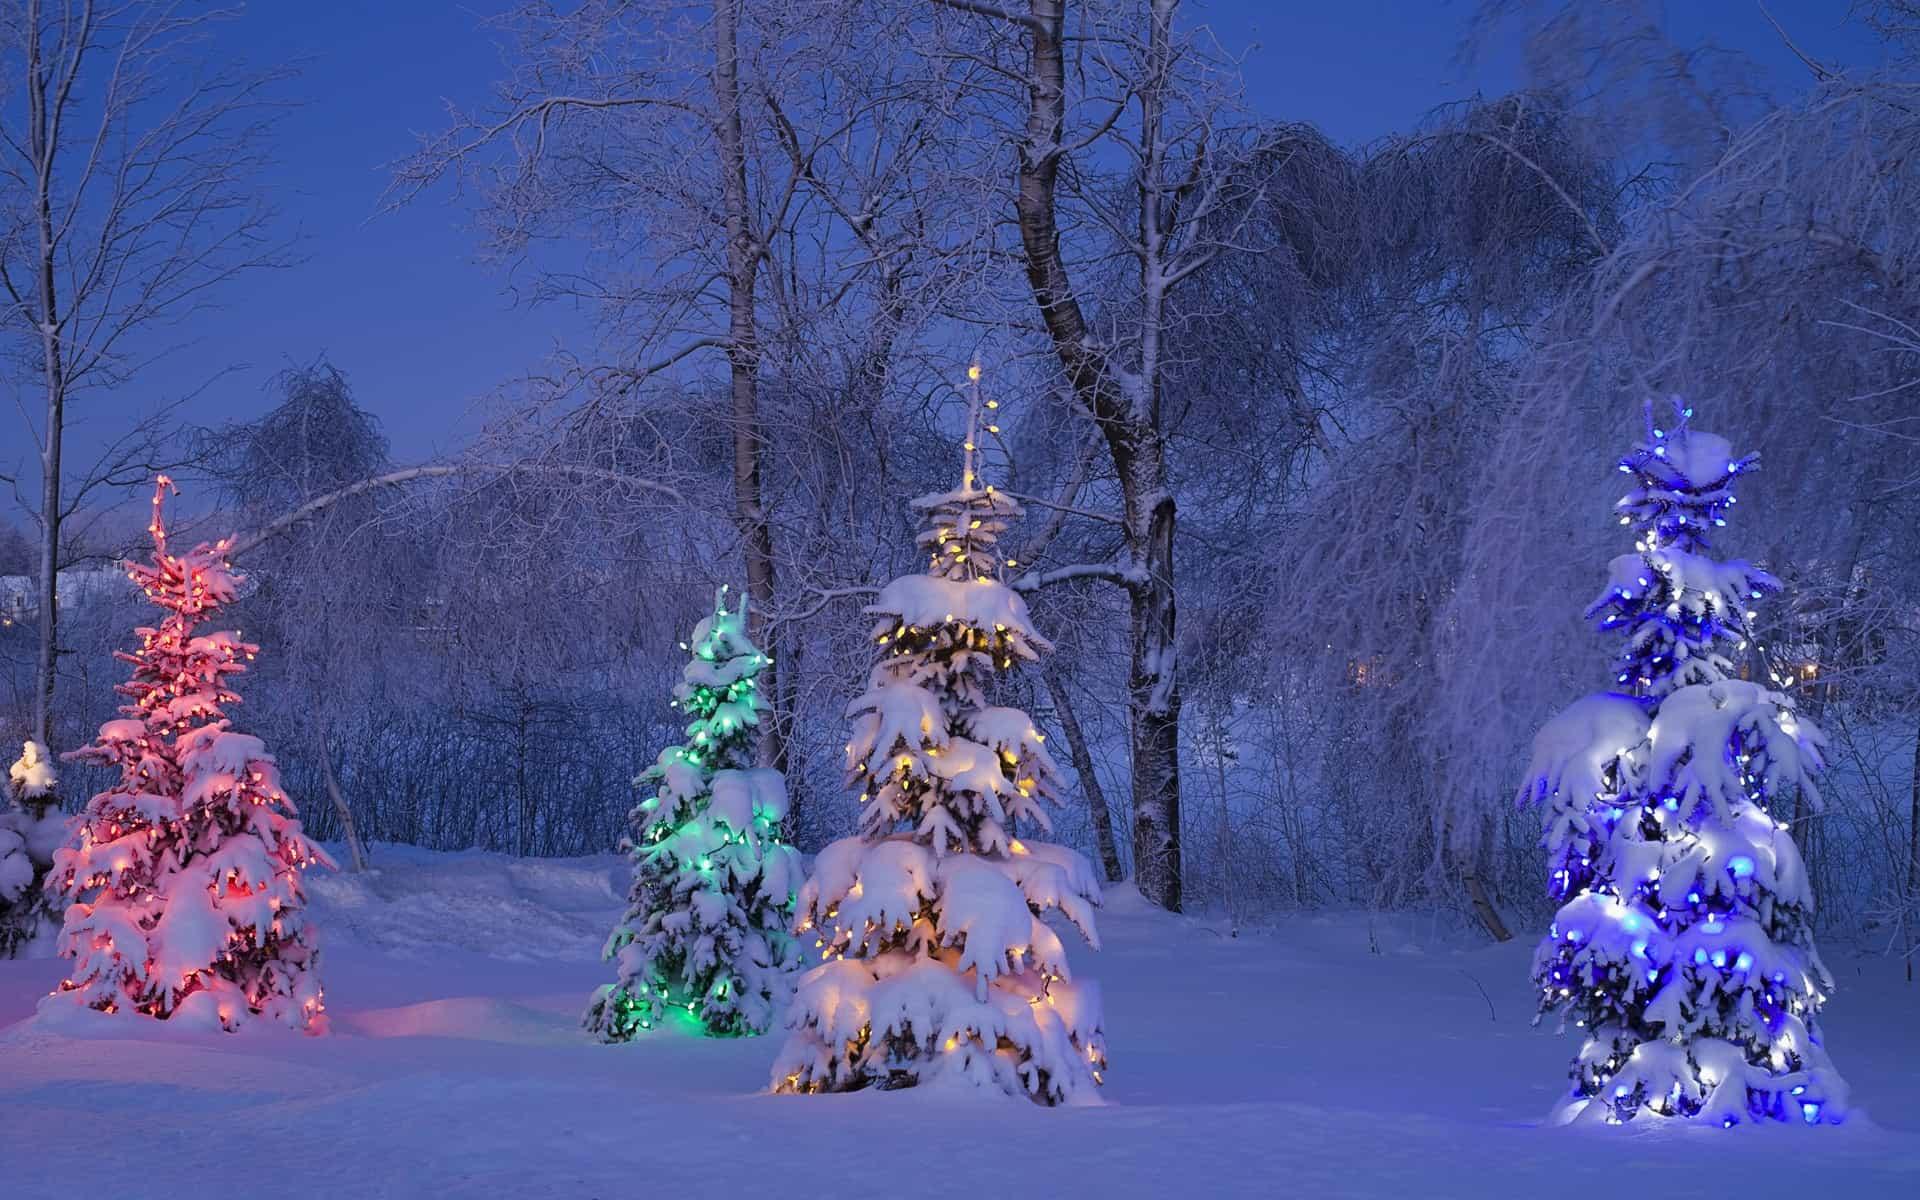 snowy lit trees winter canada - Desktop Christmas Tree